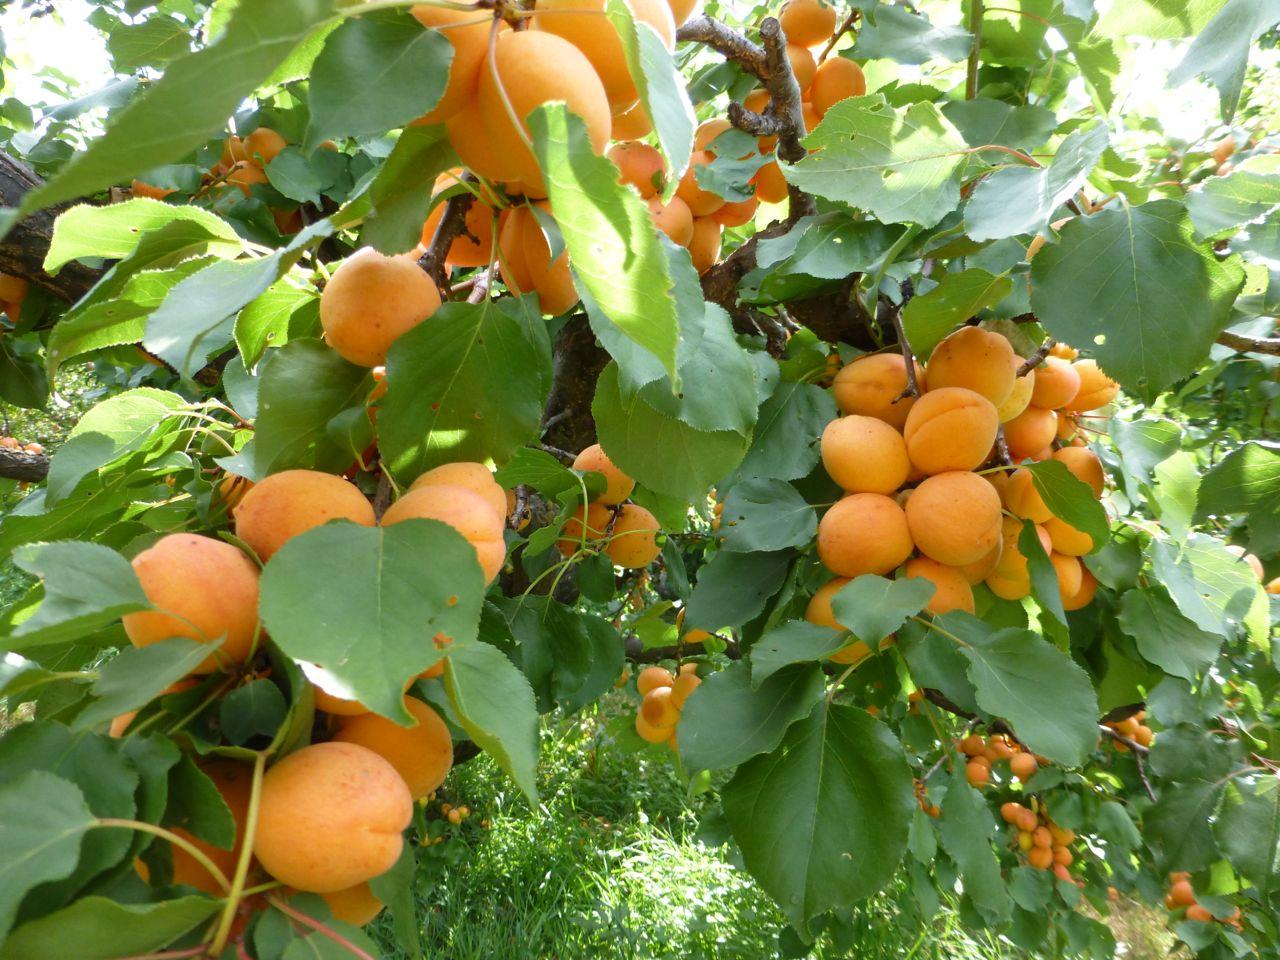 Di rio com a natureza 24 de junho damasqueiro damasco fruto flor prunus armeniaca - Alberi da frutta in giardino ...